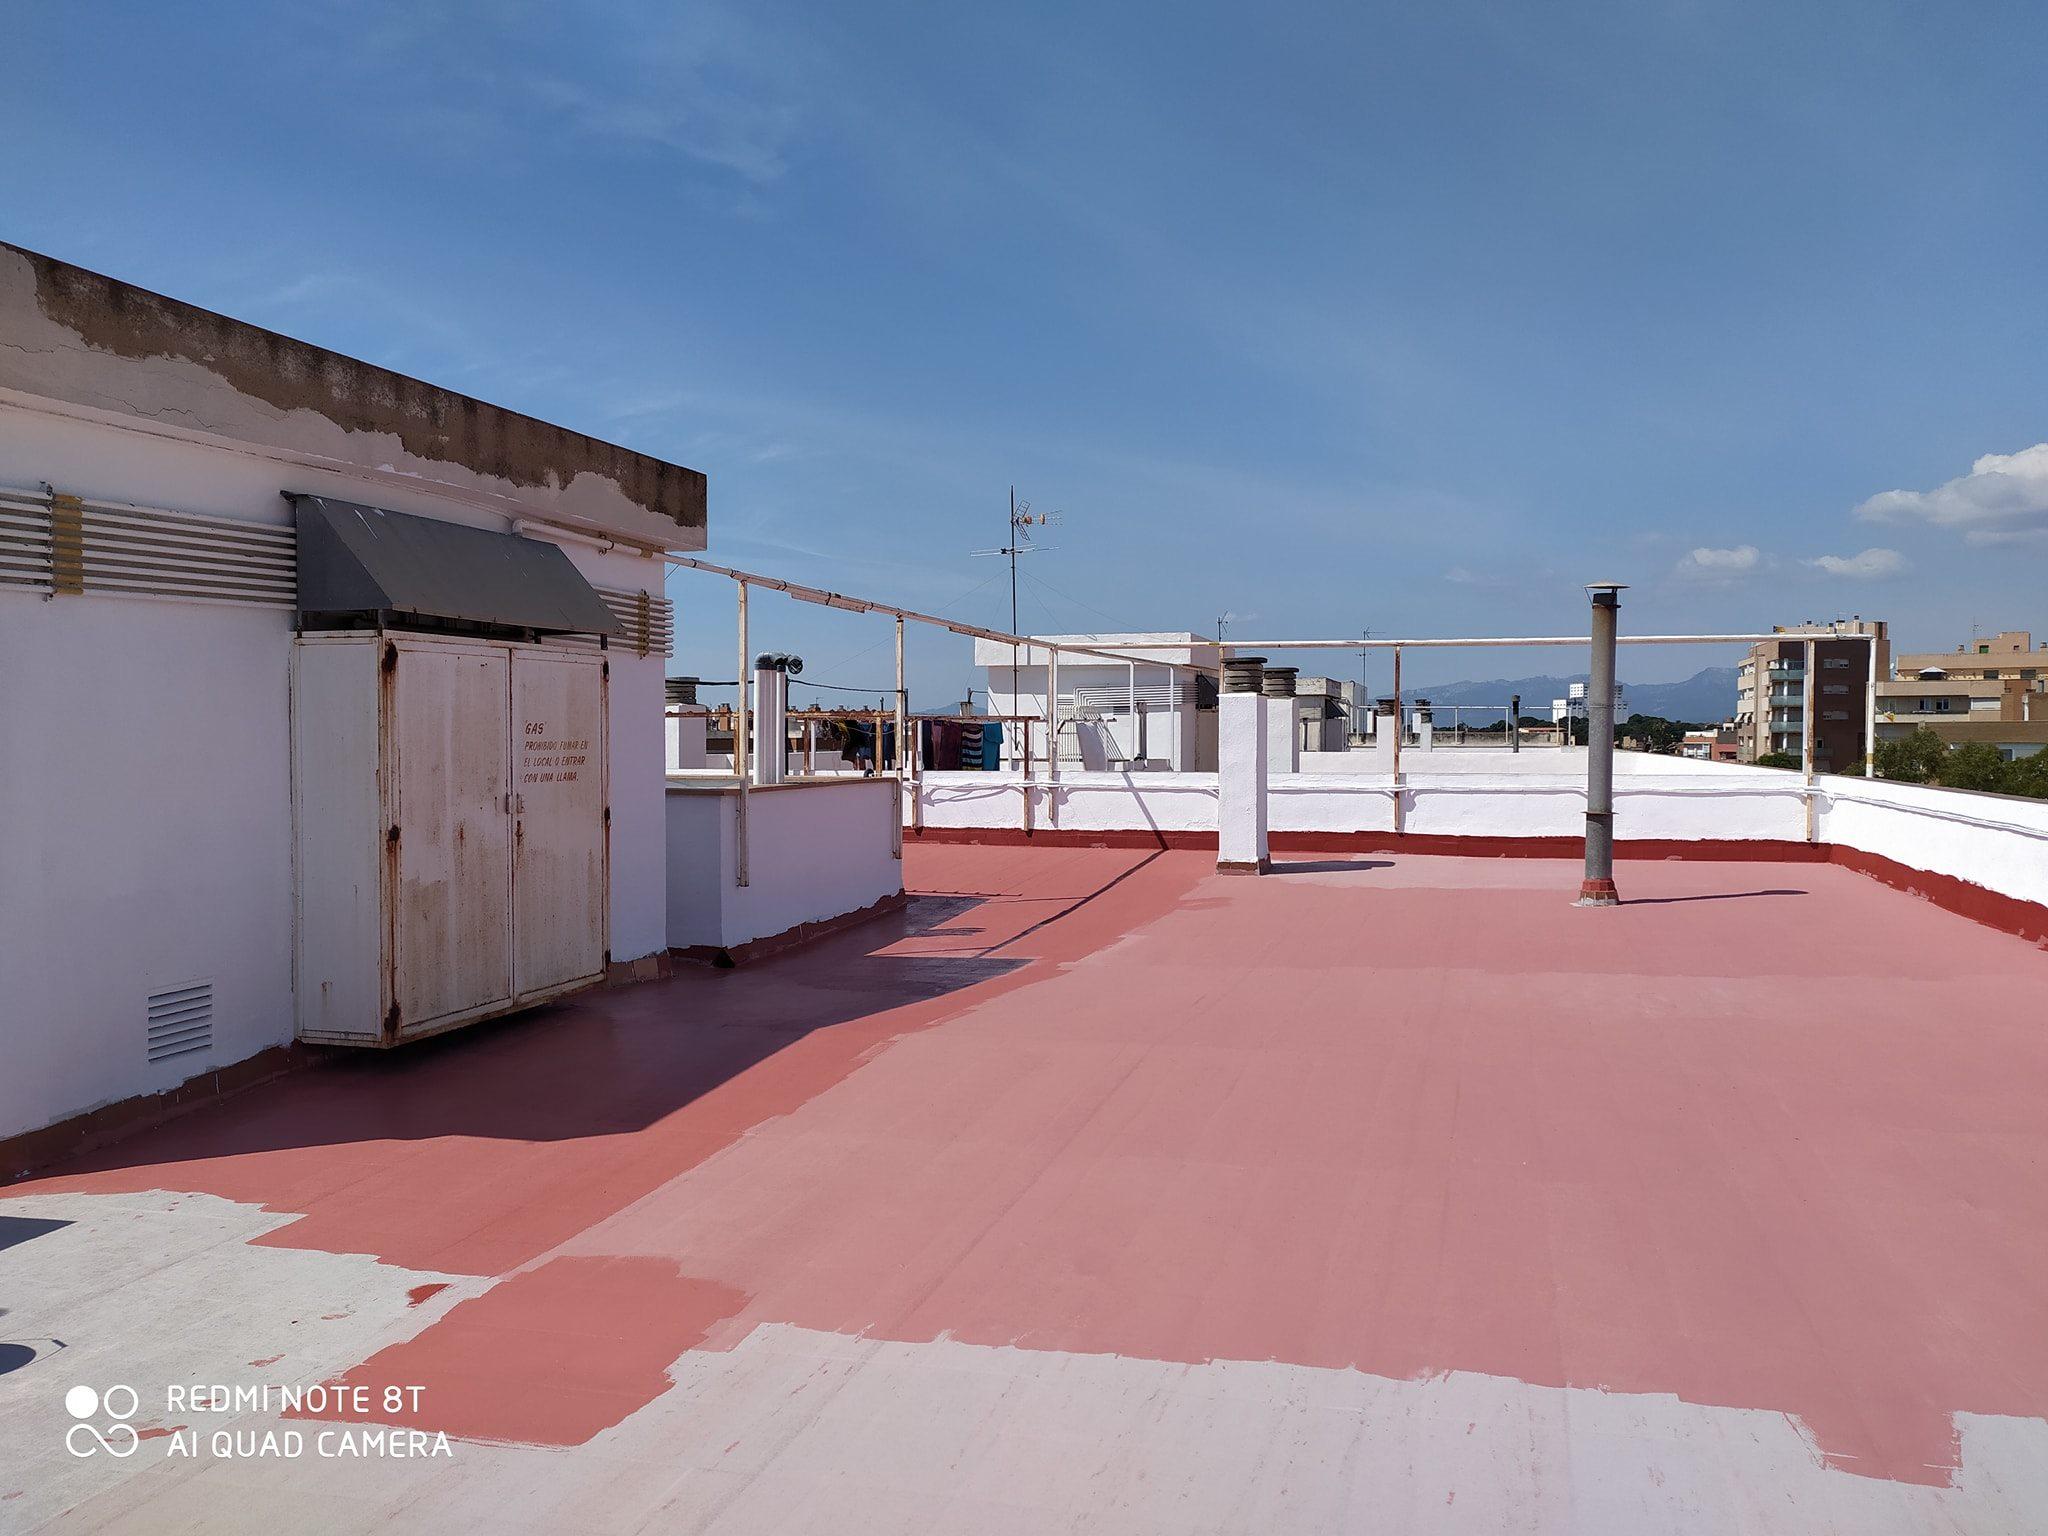 impermeabilización de terraza en Reus  blanco